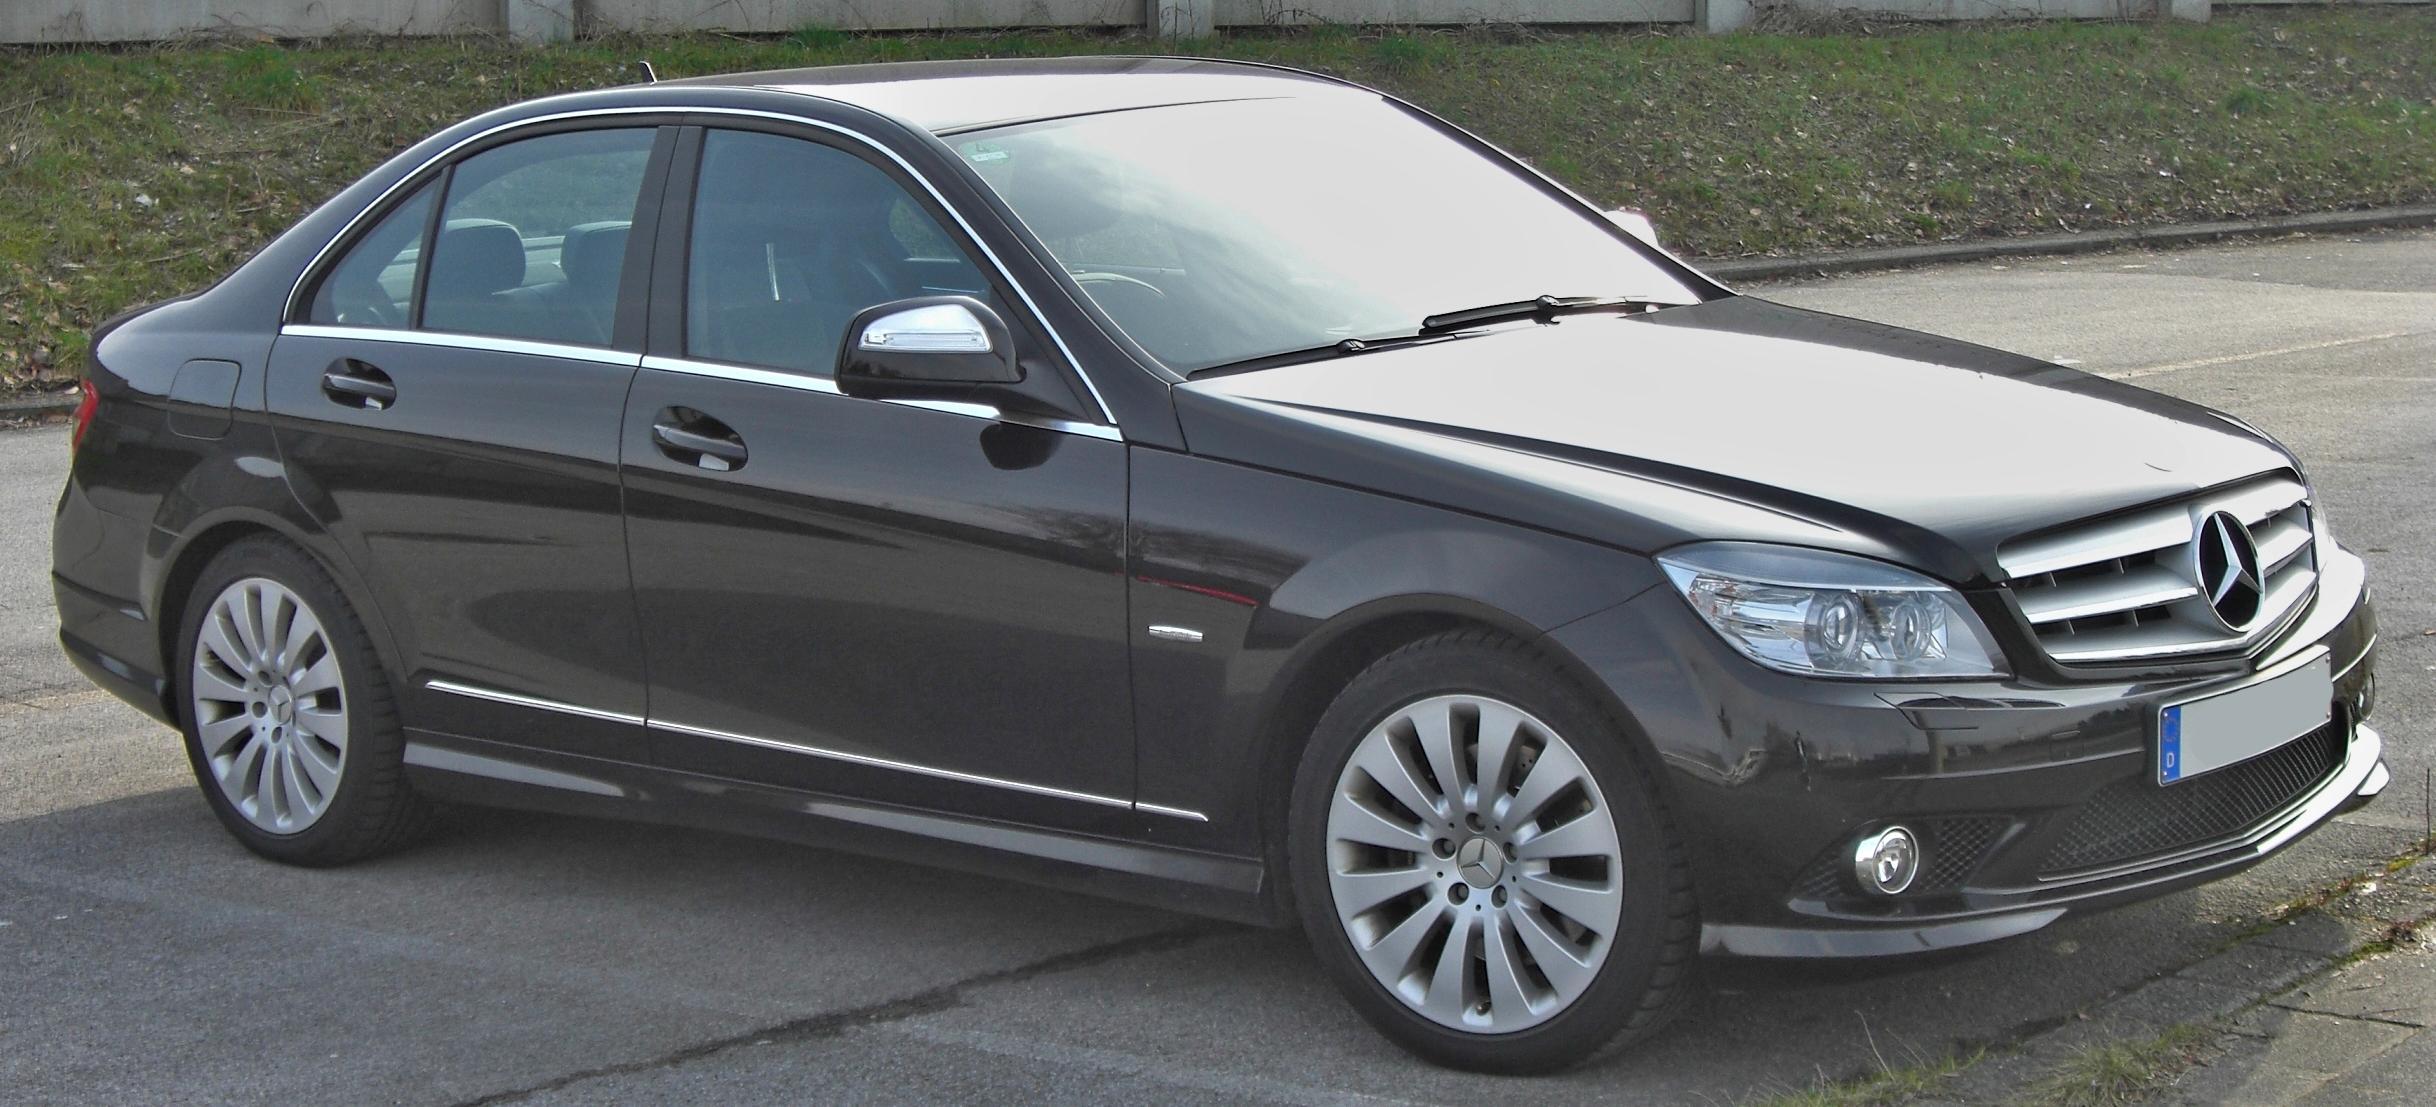 Mercedes C Klasse W Kombi L Ef Bf Bdnge